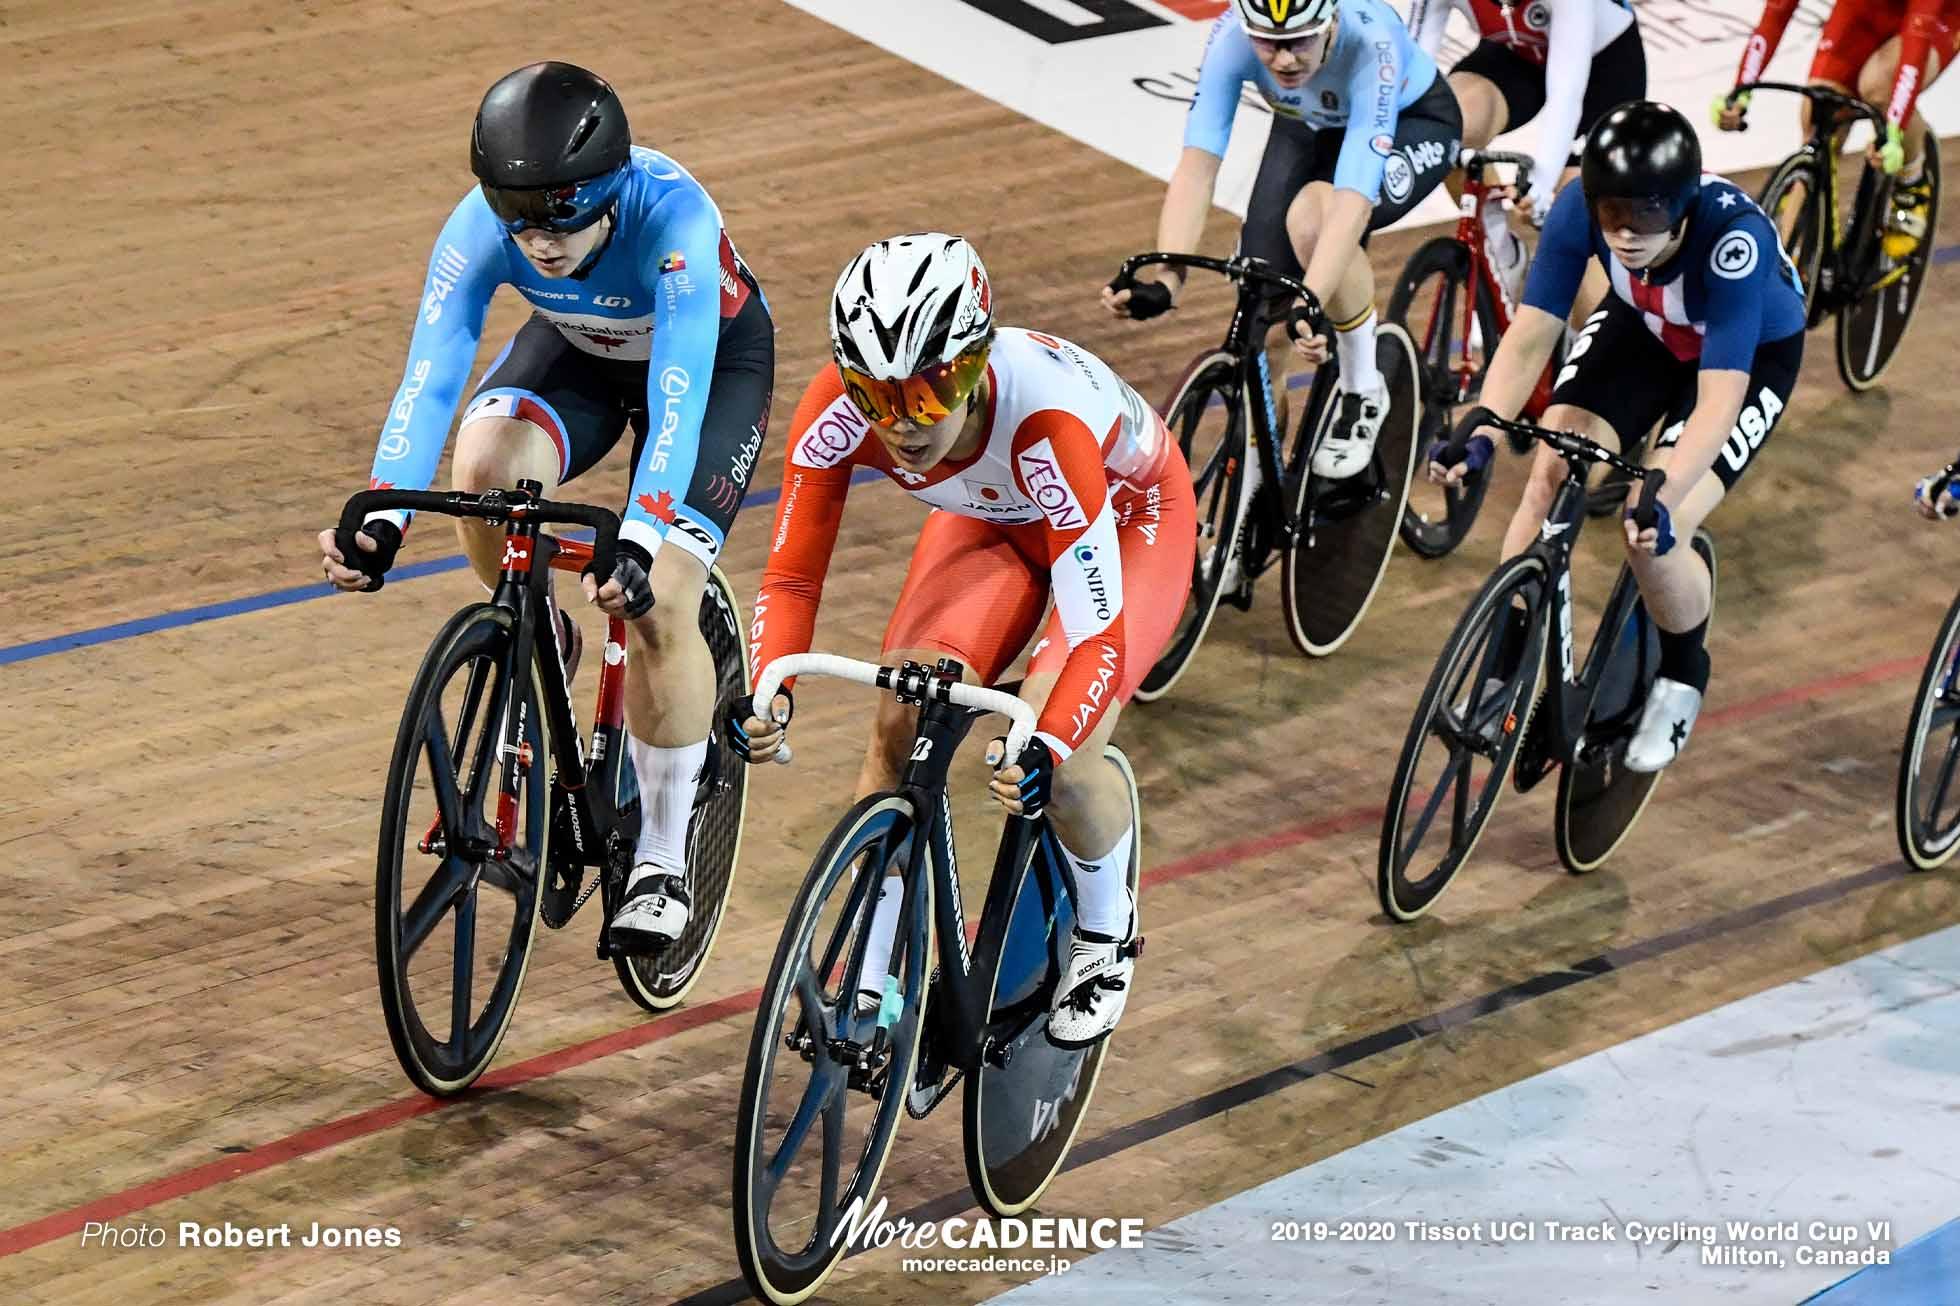 Women's Omnium / TISSOT UCI TRACK CYCLING WORLD CUP VI, Milton, Canada, 中村妃智